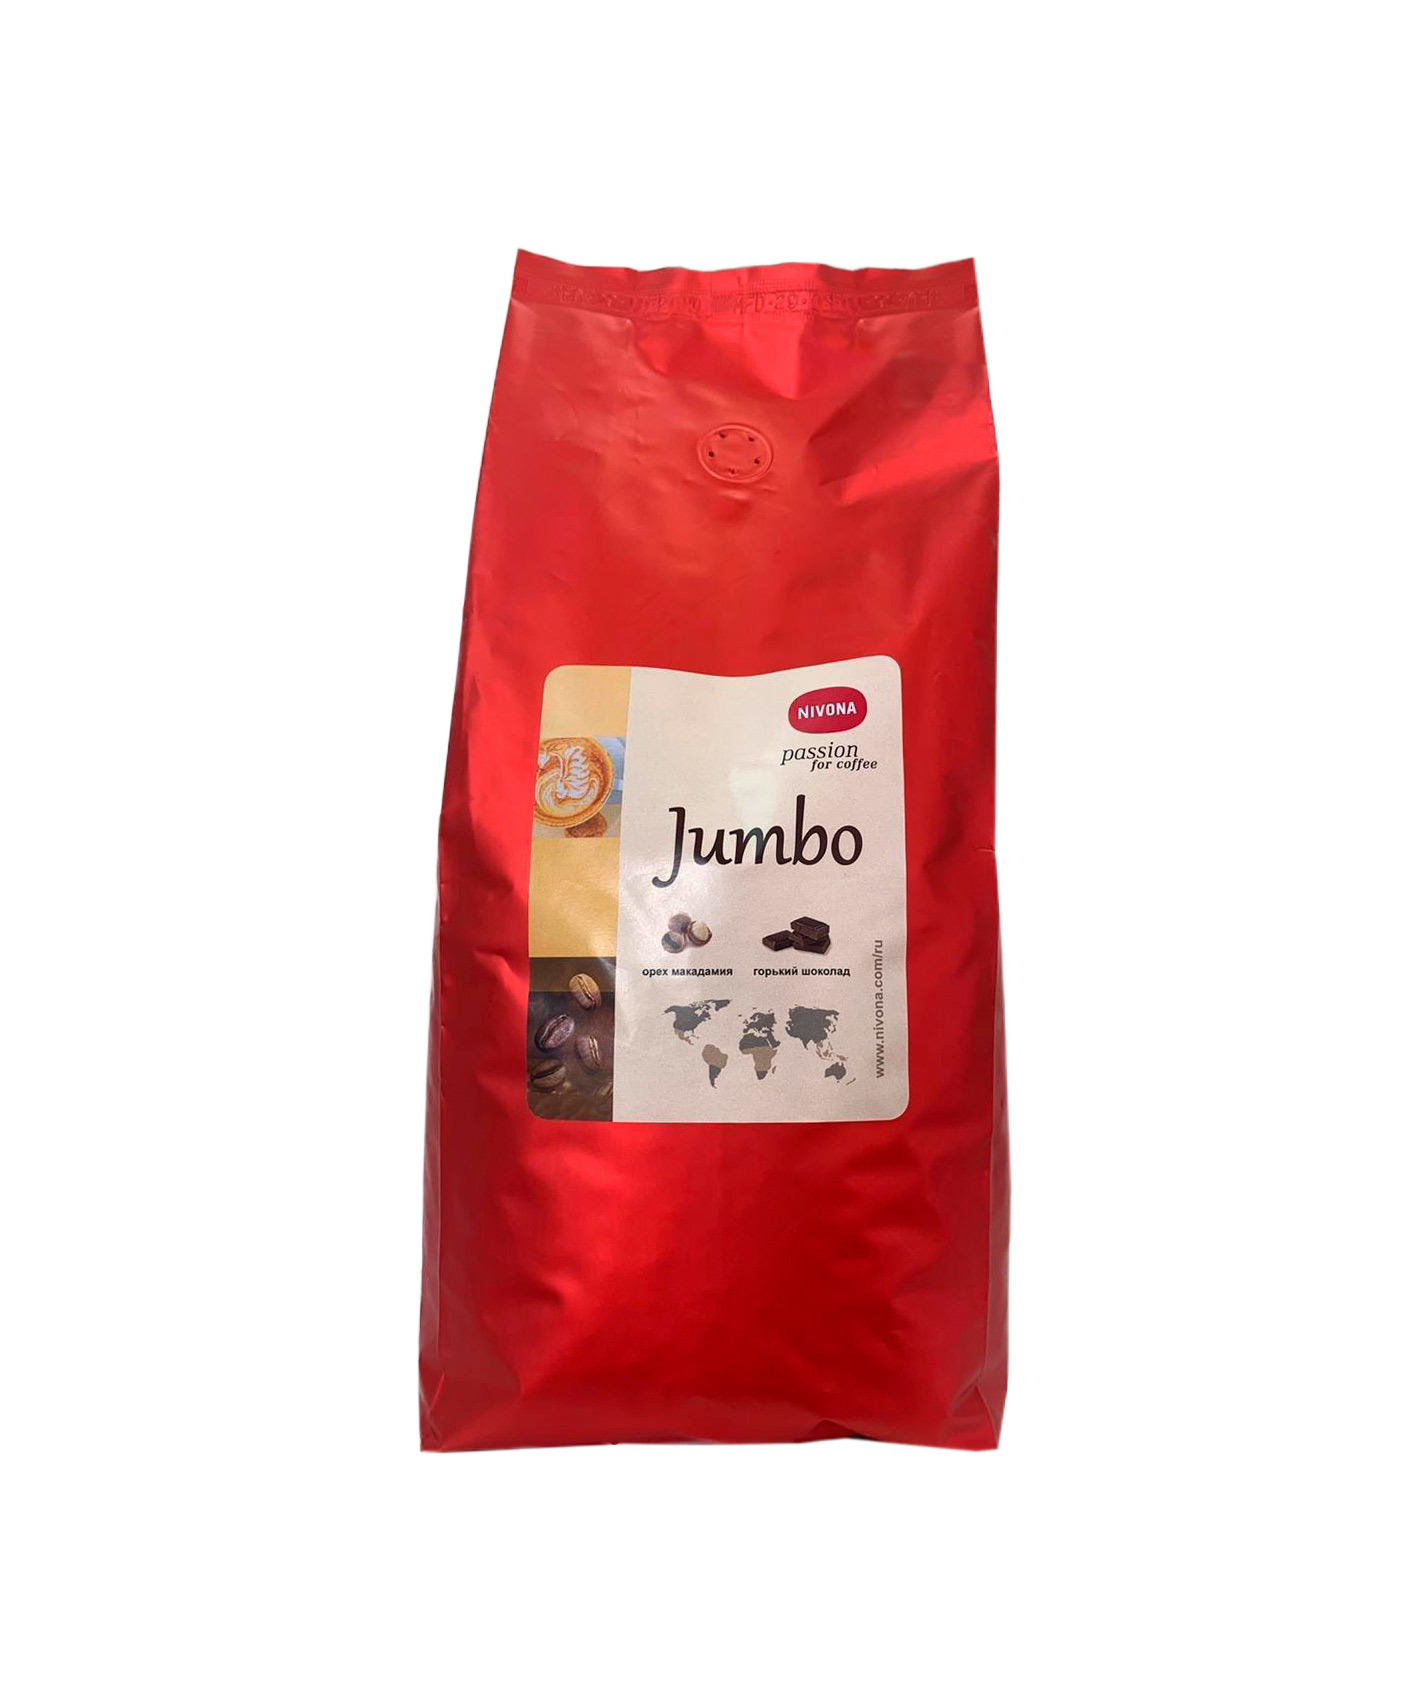 Кофе в зернах Nivona Jumbo, 1кг